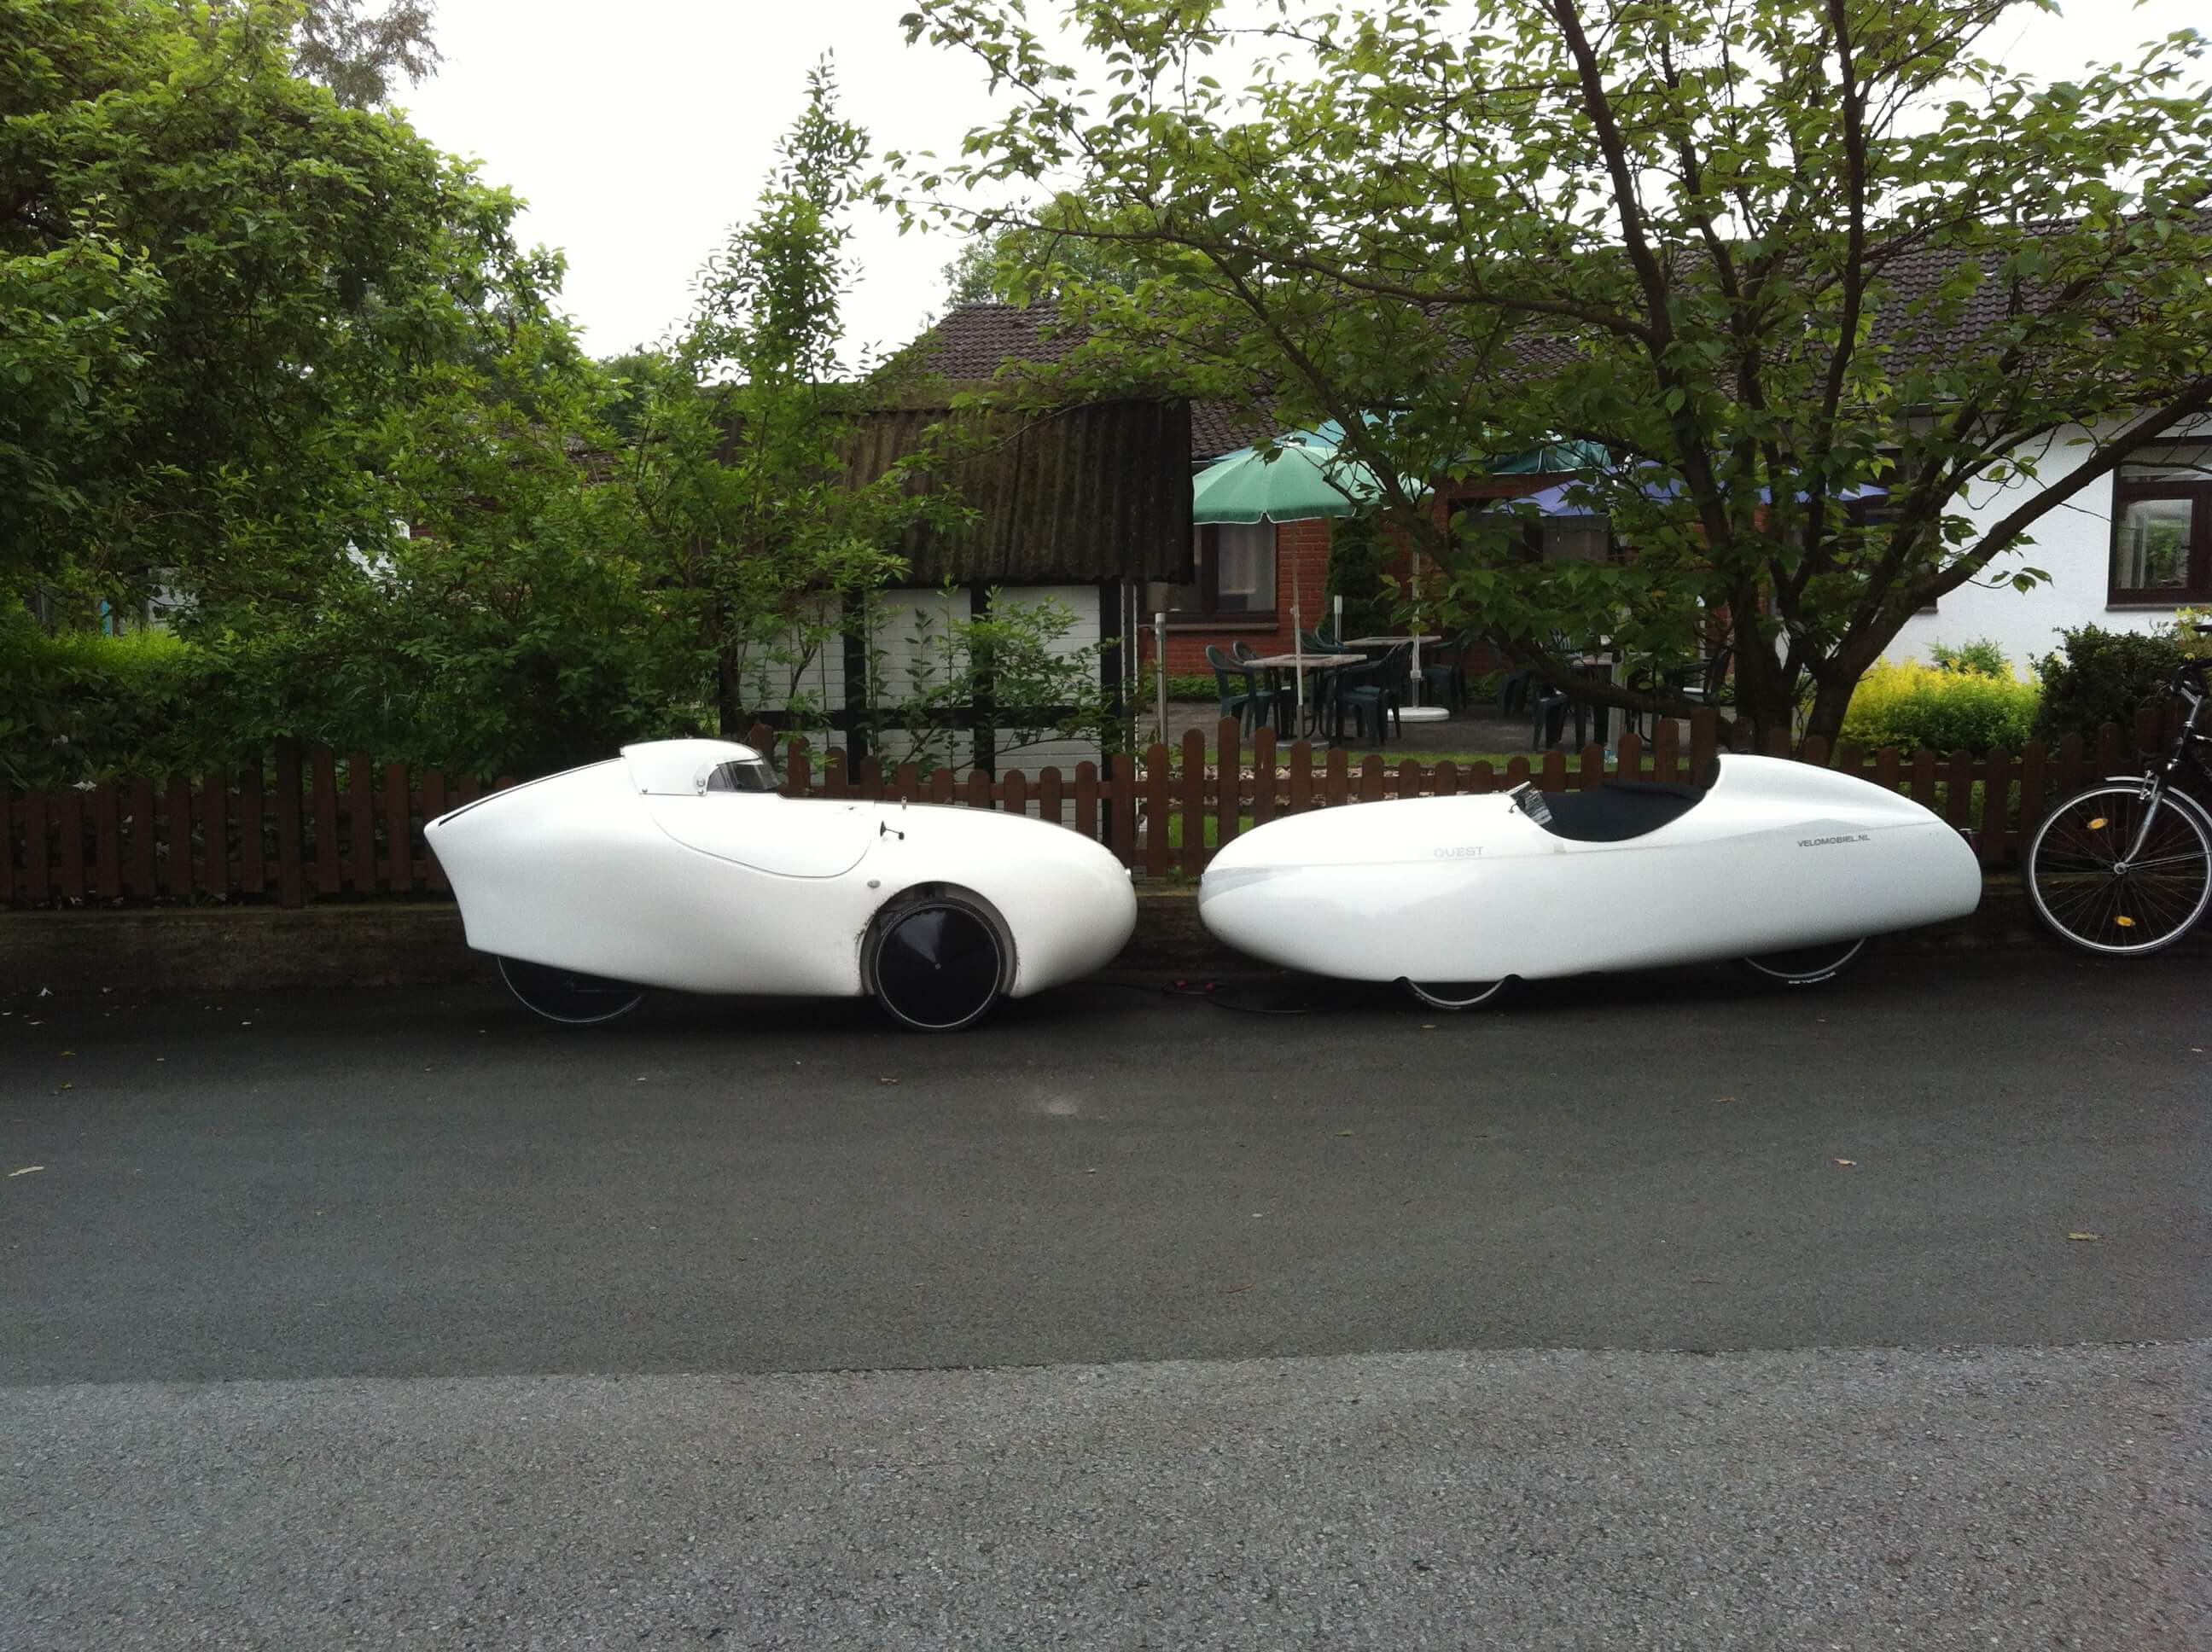 velomobile wenn radfahrer unter die haube kommen paderlieger liegerad velomobil trike in. Black Bedroom Furniture Sets. Home Design Ideas